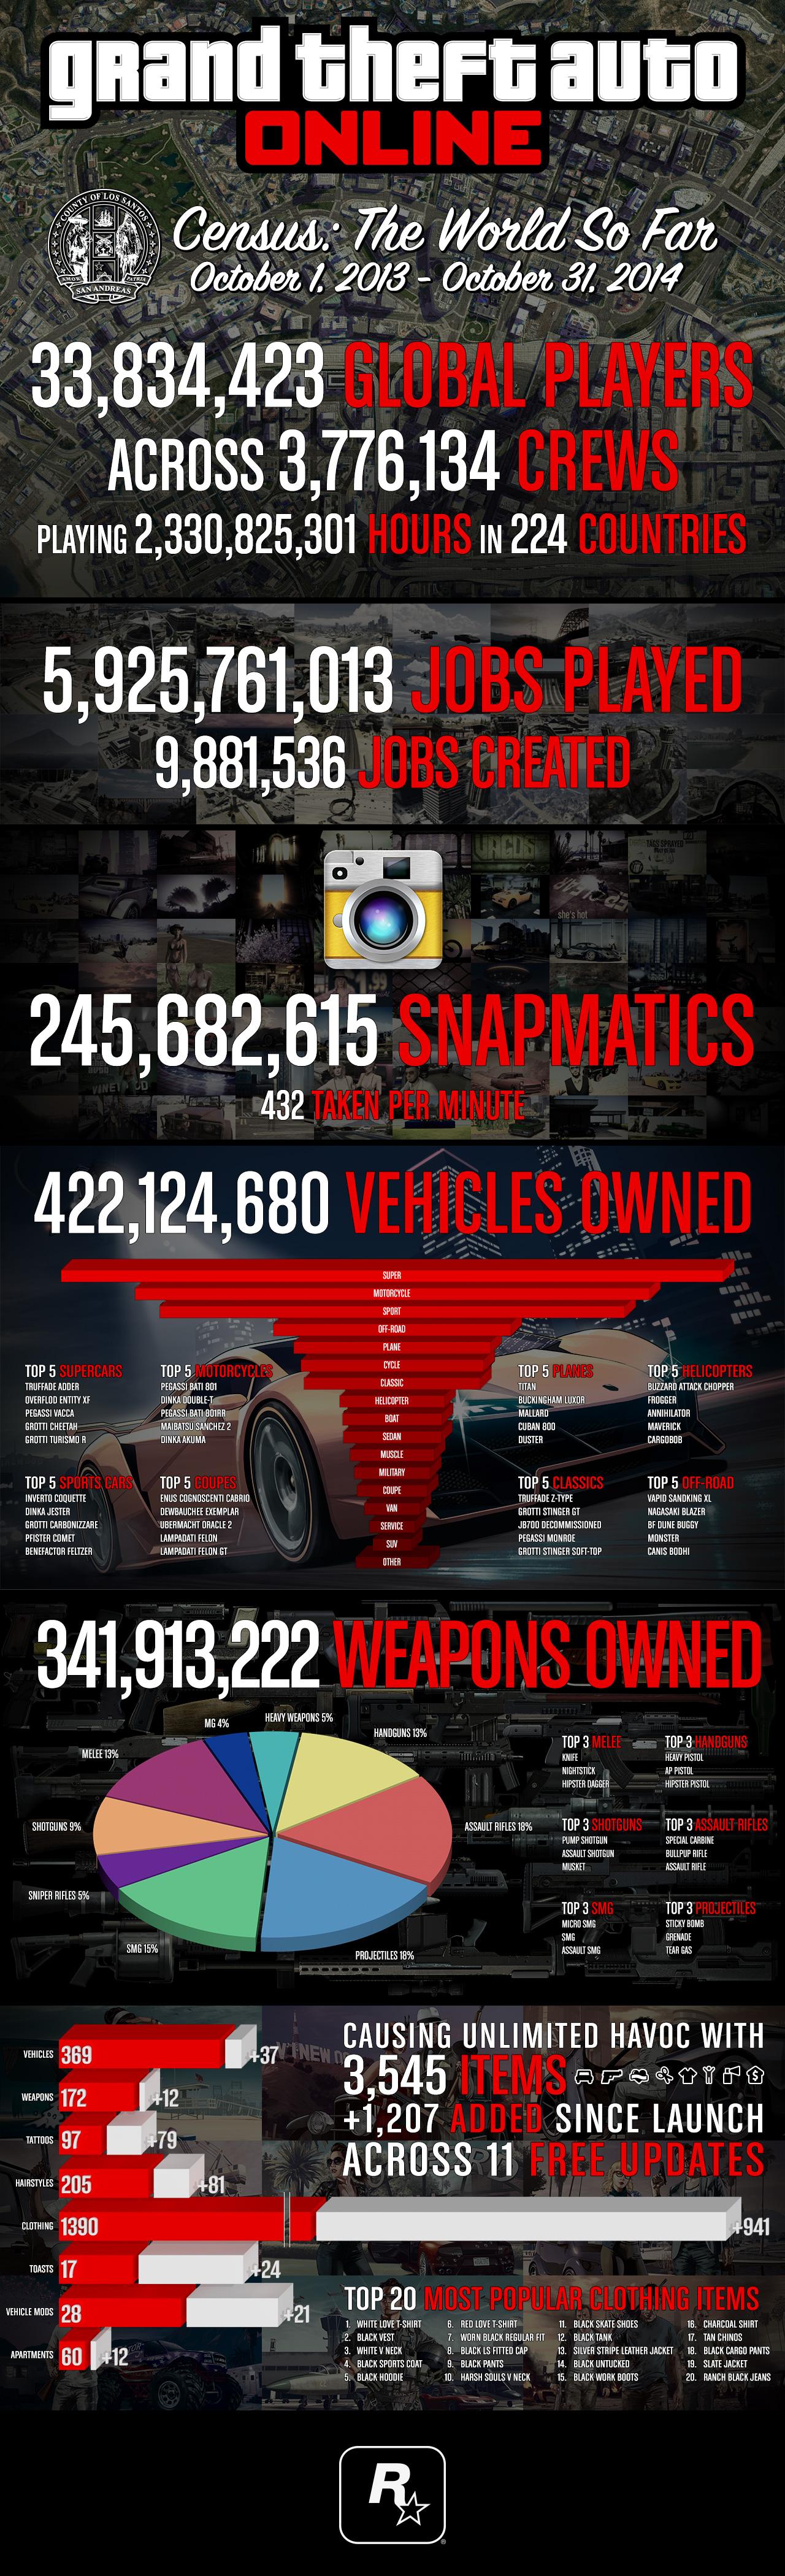 GTA Online Stats